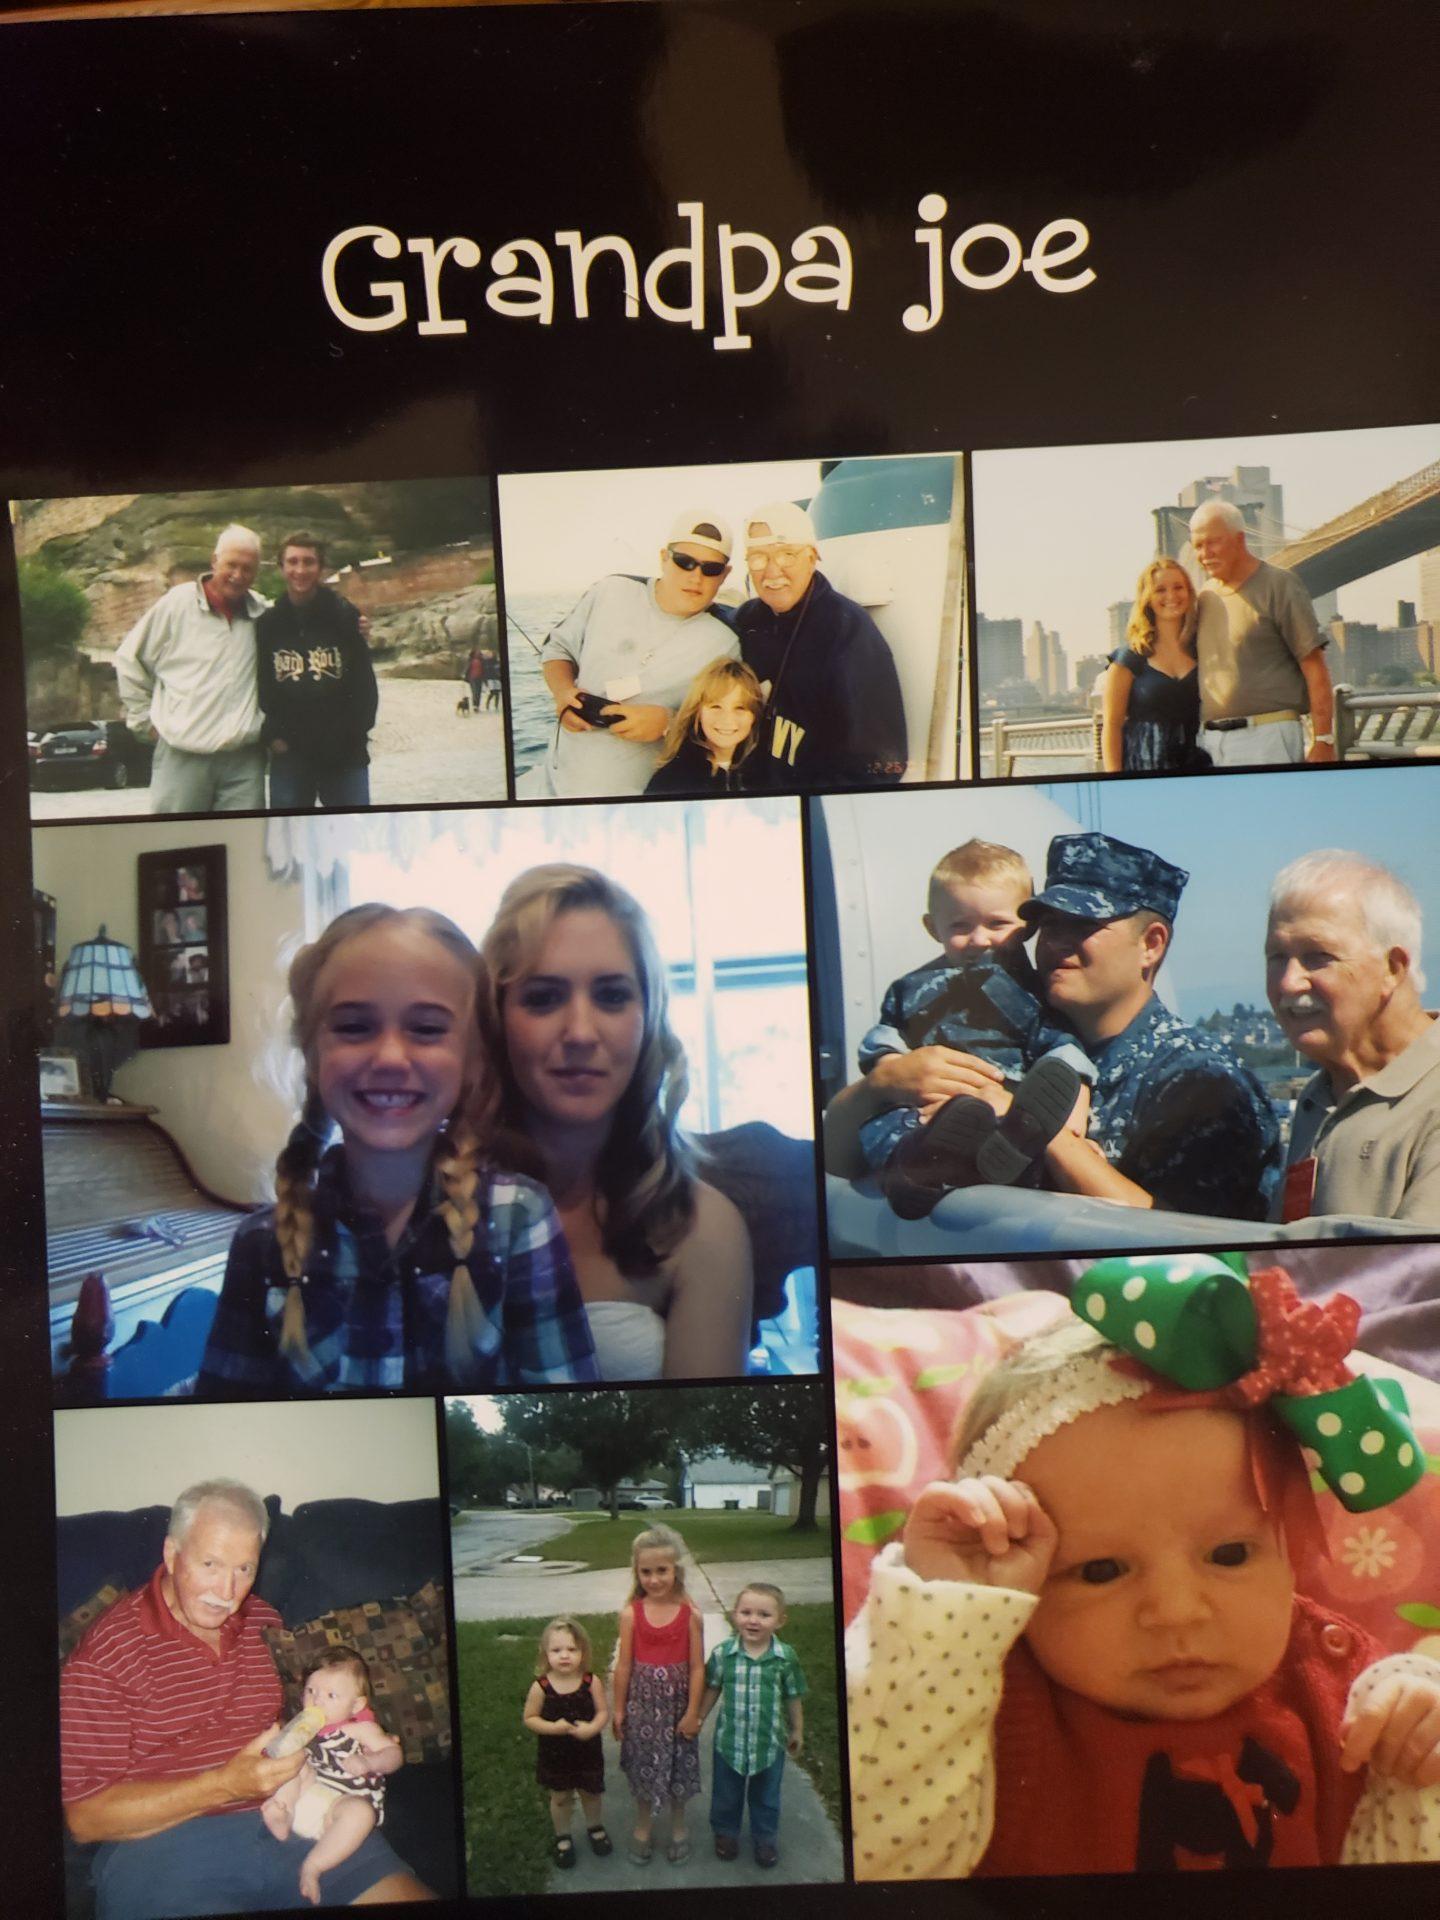 Dad to Grandpa